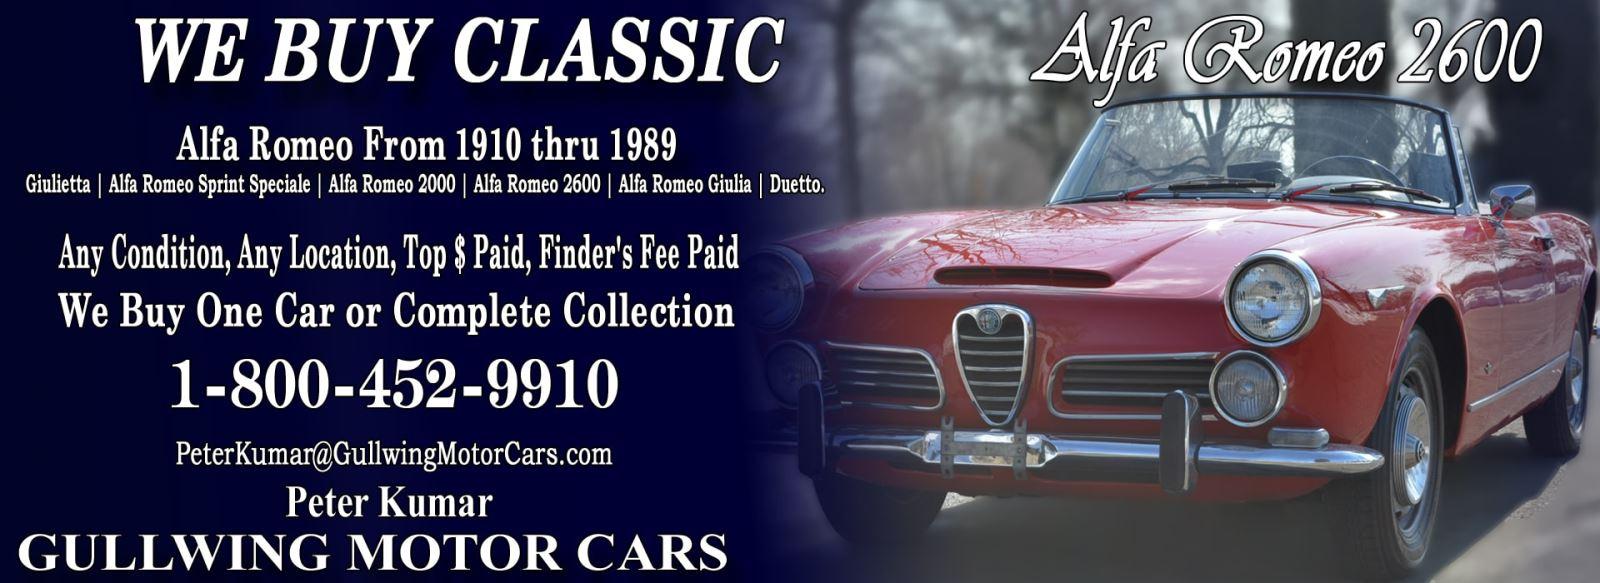 Classic Alfa Romeo 2600 for sale, we buy vintage Alfa Romeo 2600. Call Peter Kumar. Gullwing Motor